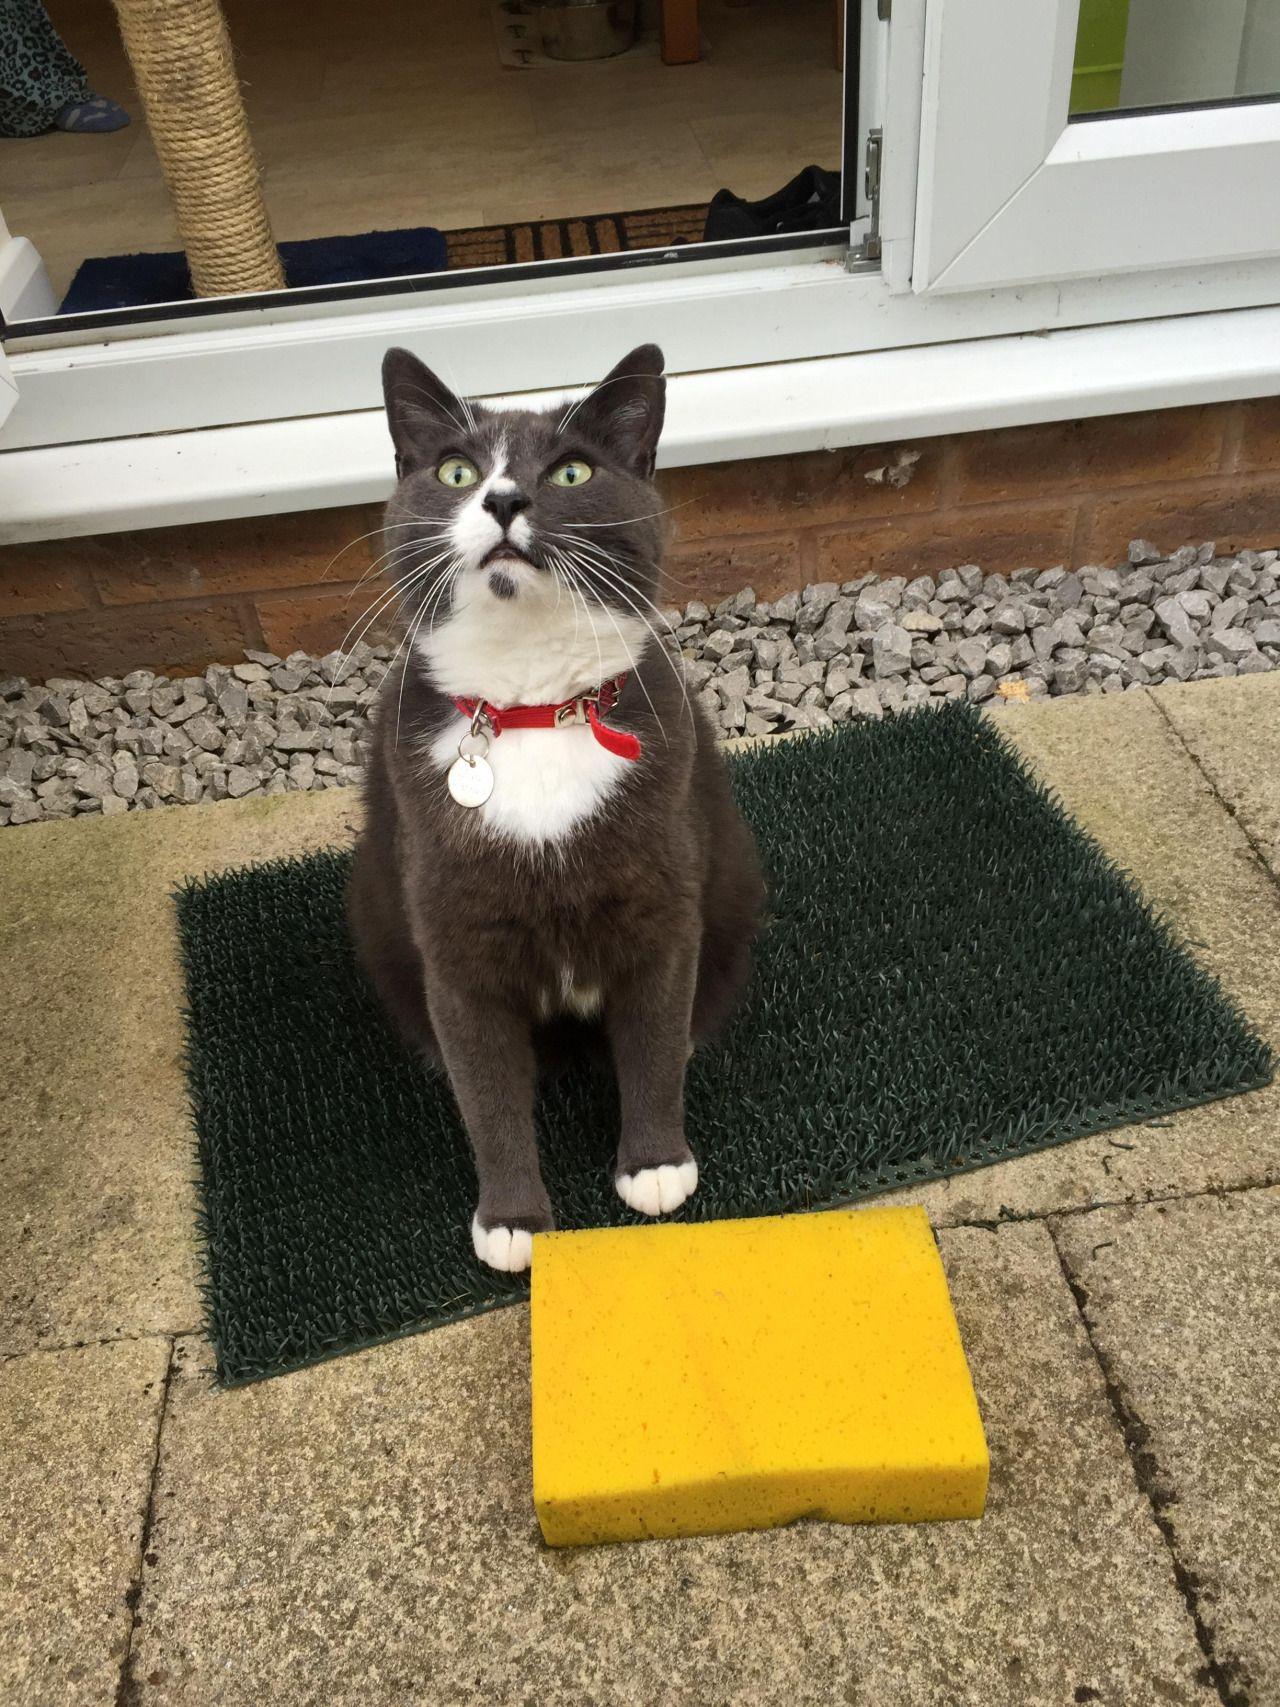 Our cat wont stop bringing home sponges!